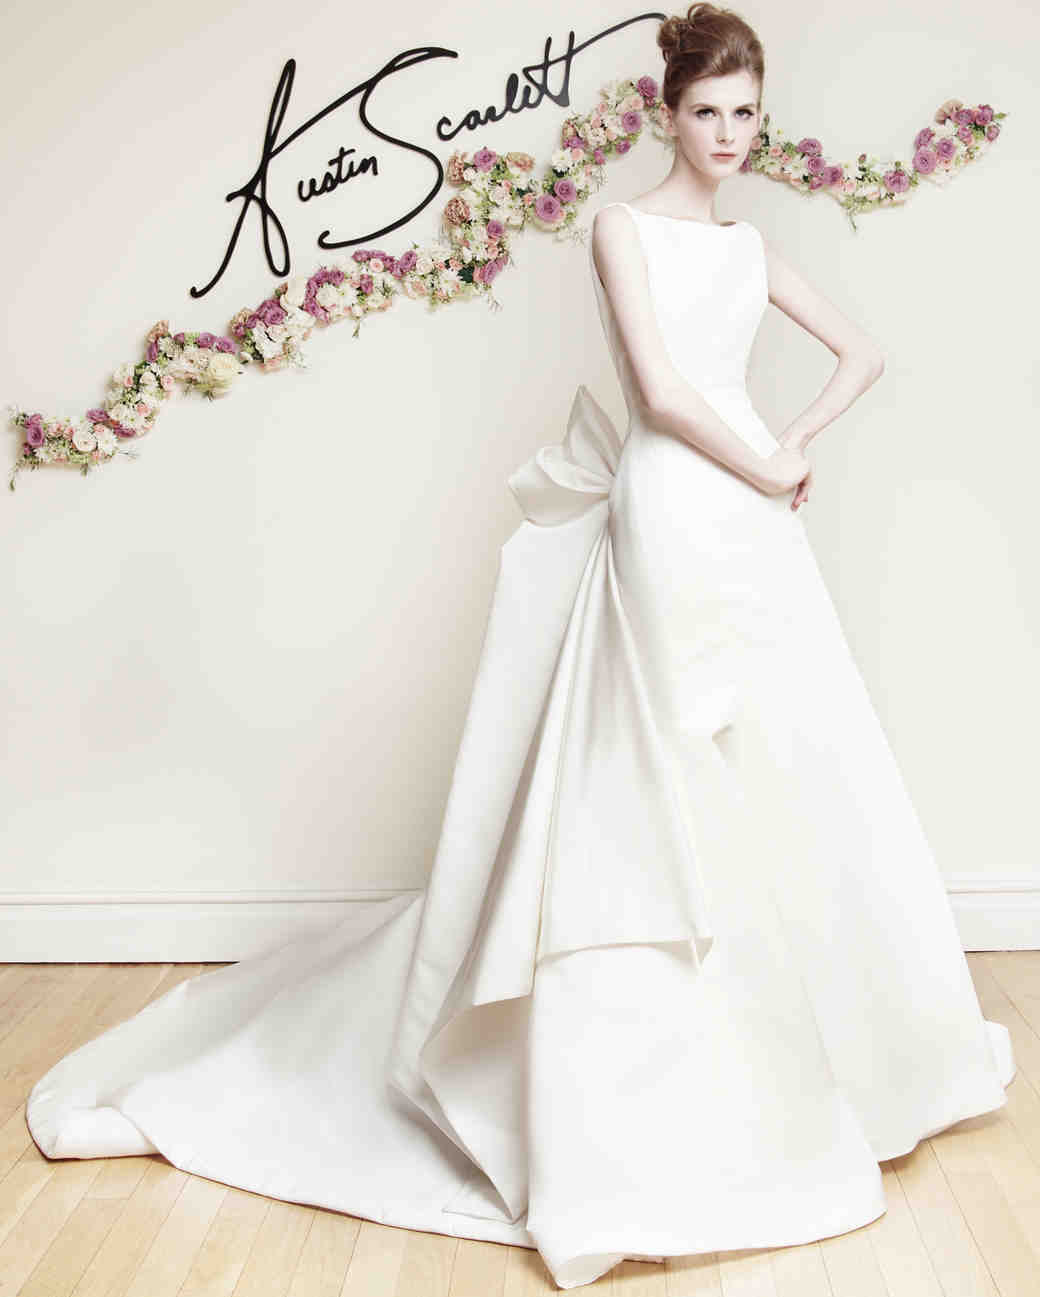 50-states-wedding-dresses-south-dakota-austin-scarlett-0615.jpg